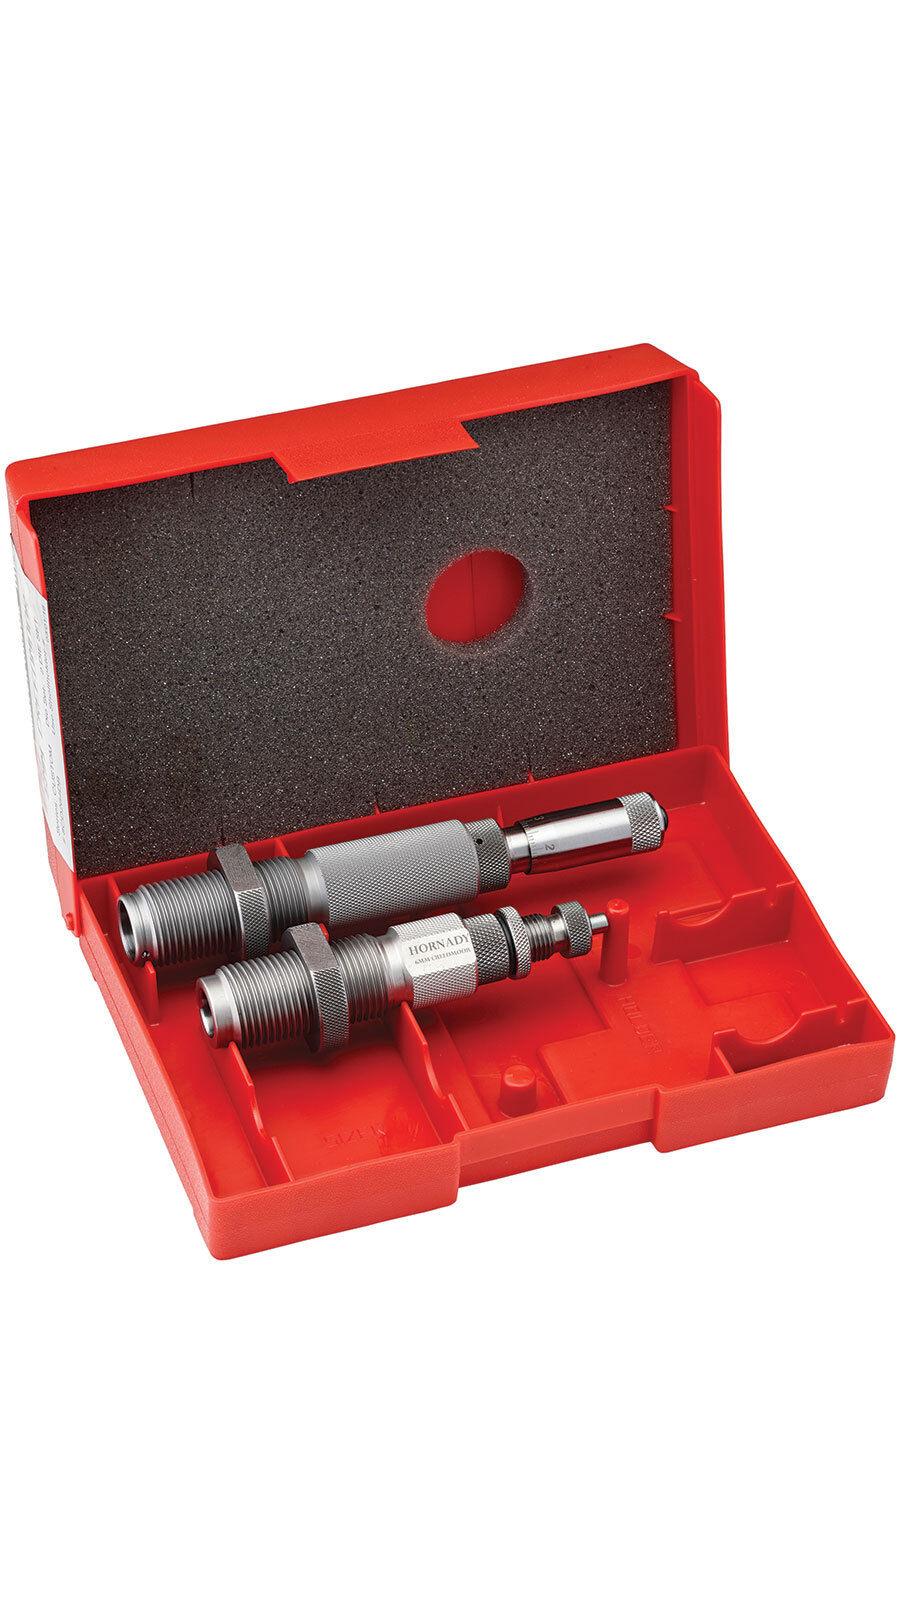 Hornady Reloading Match Grade Die Die Grade Set 6mm Br 544249 d84c77